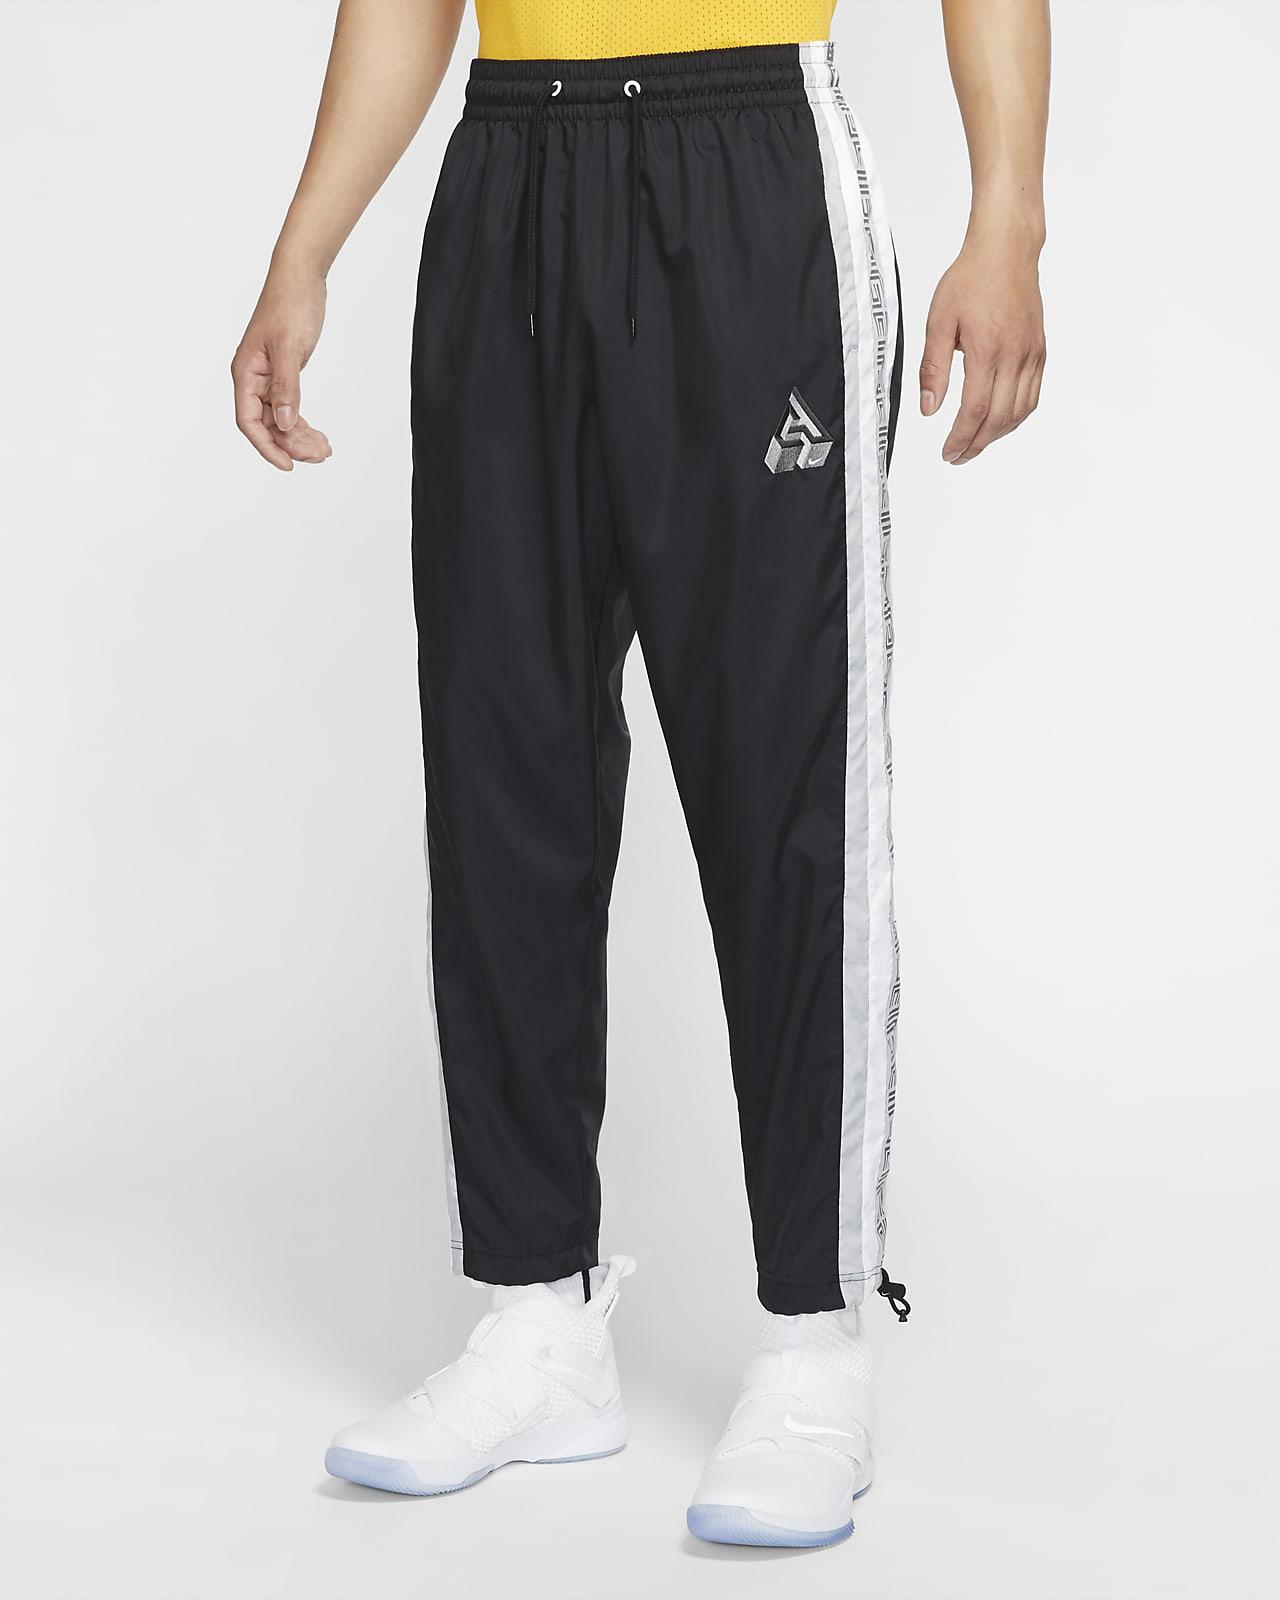 Giannis Men's Track Pants